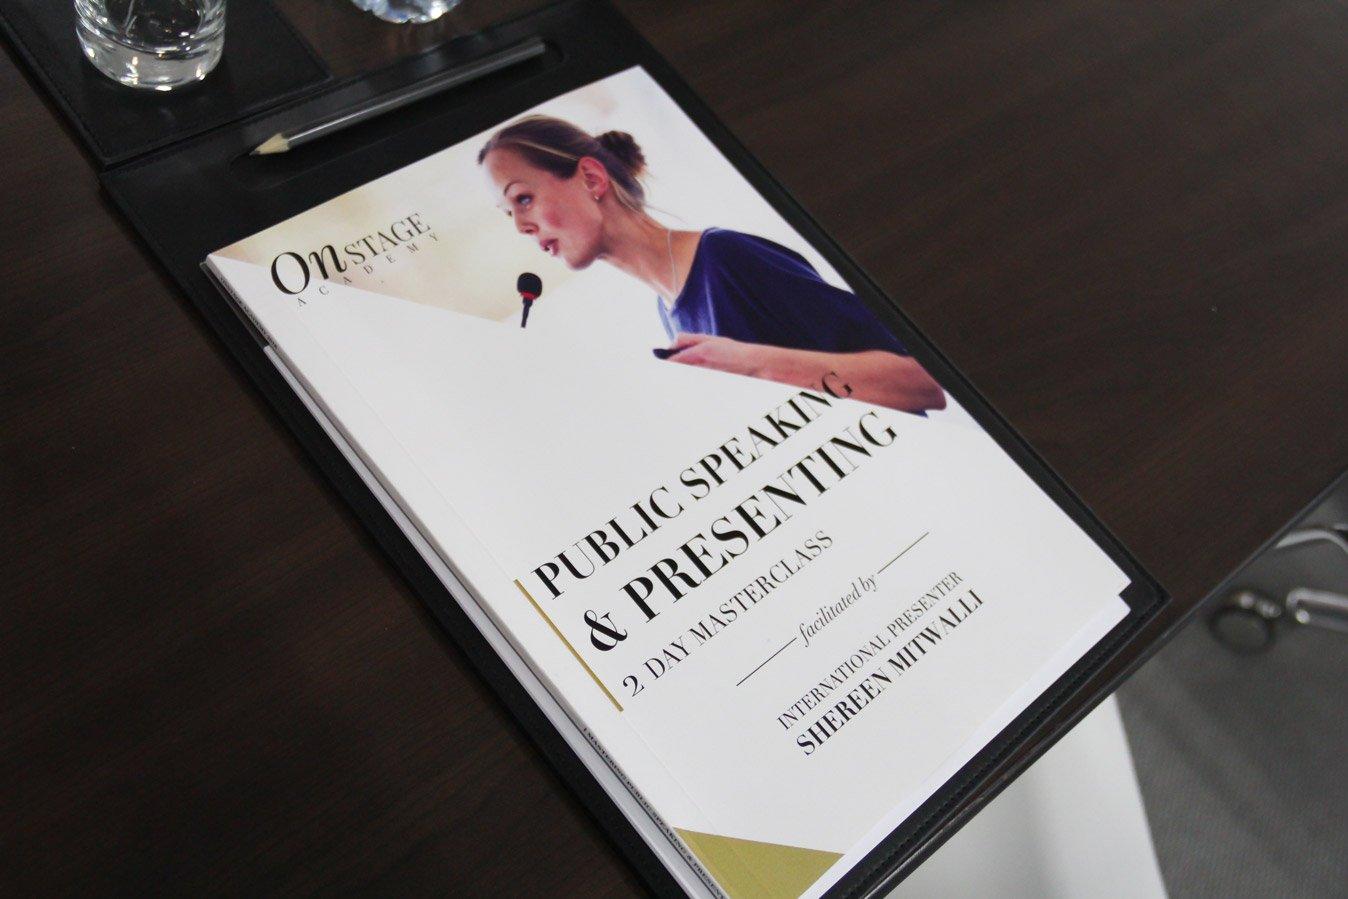 Shereen Mitwalli Best Public Speaker presents Public Speaking Masterclass Book